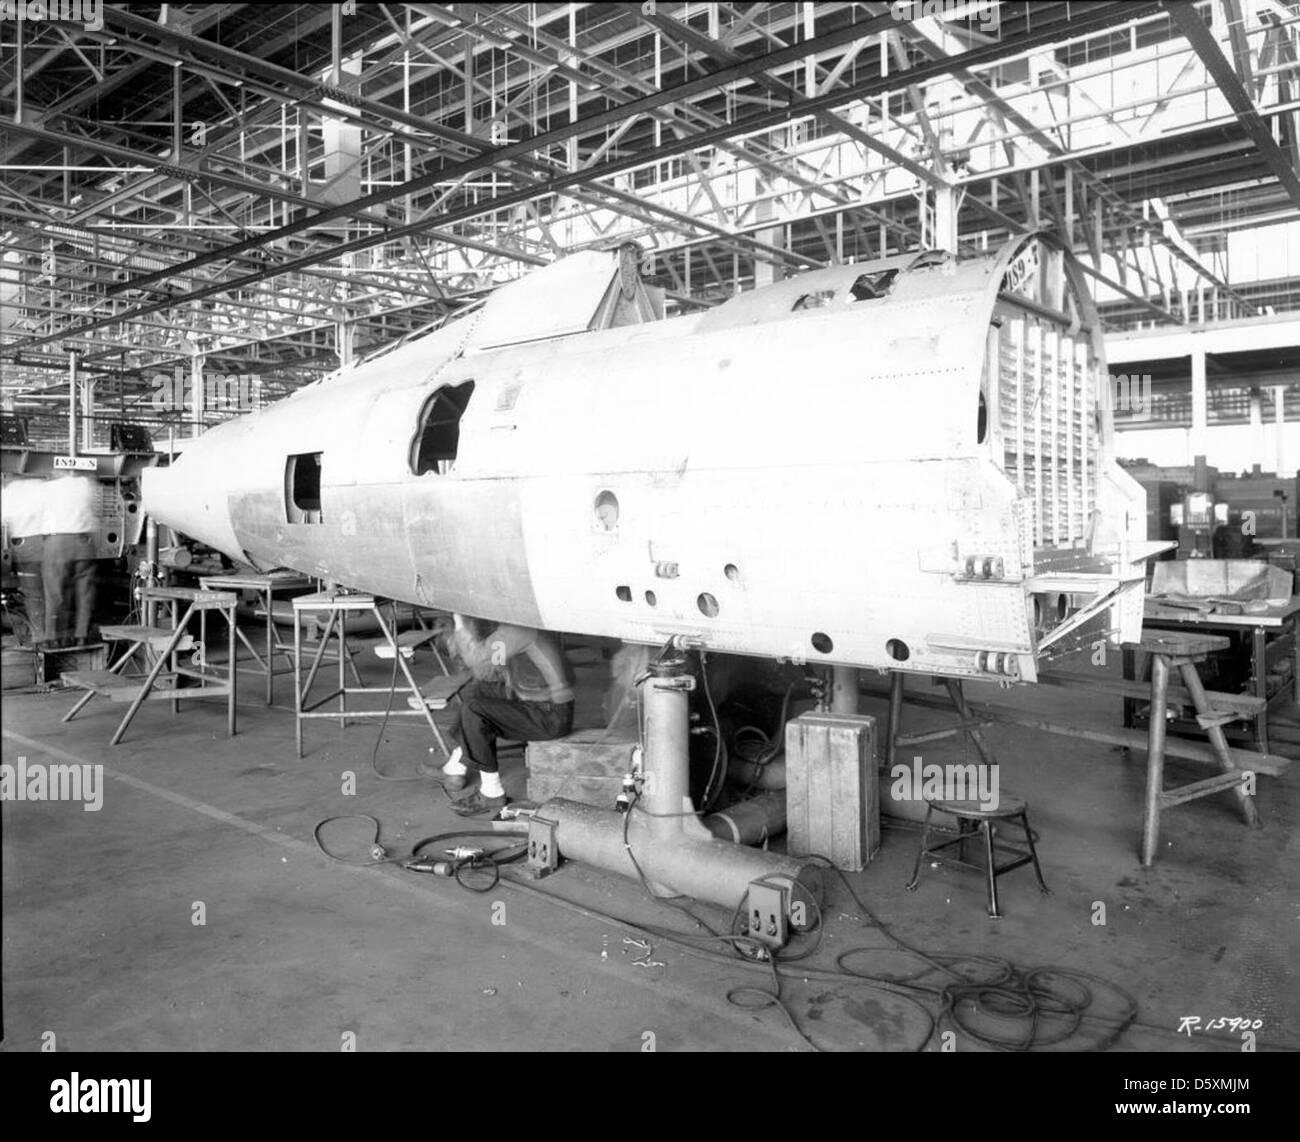 Republic P-47B 'Thunderbolt' fuselage construction. - Stock Image